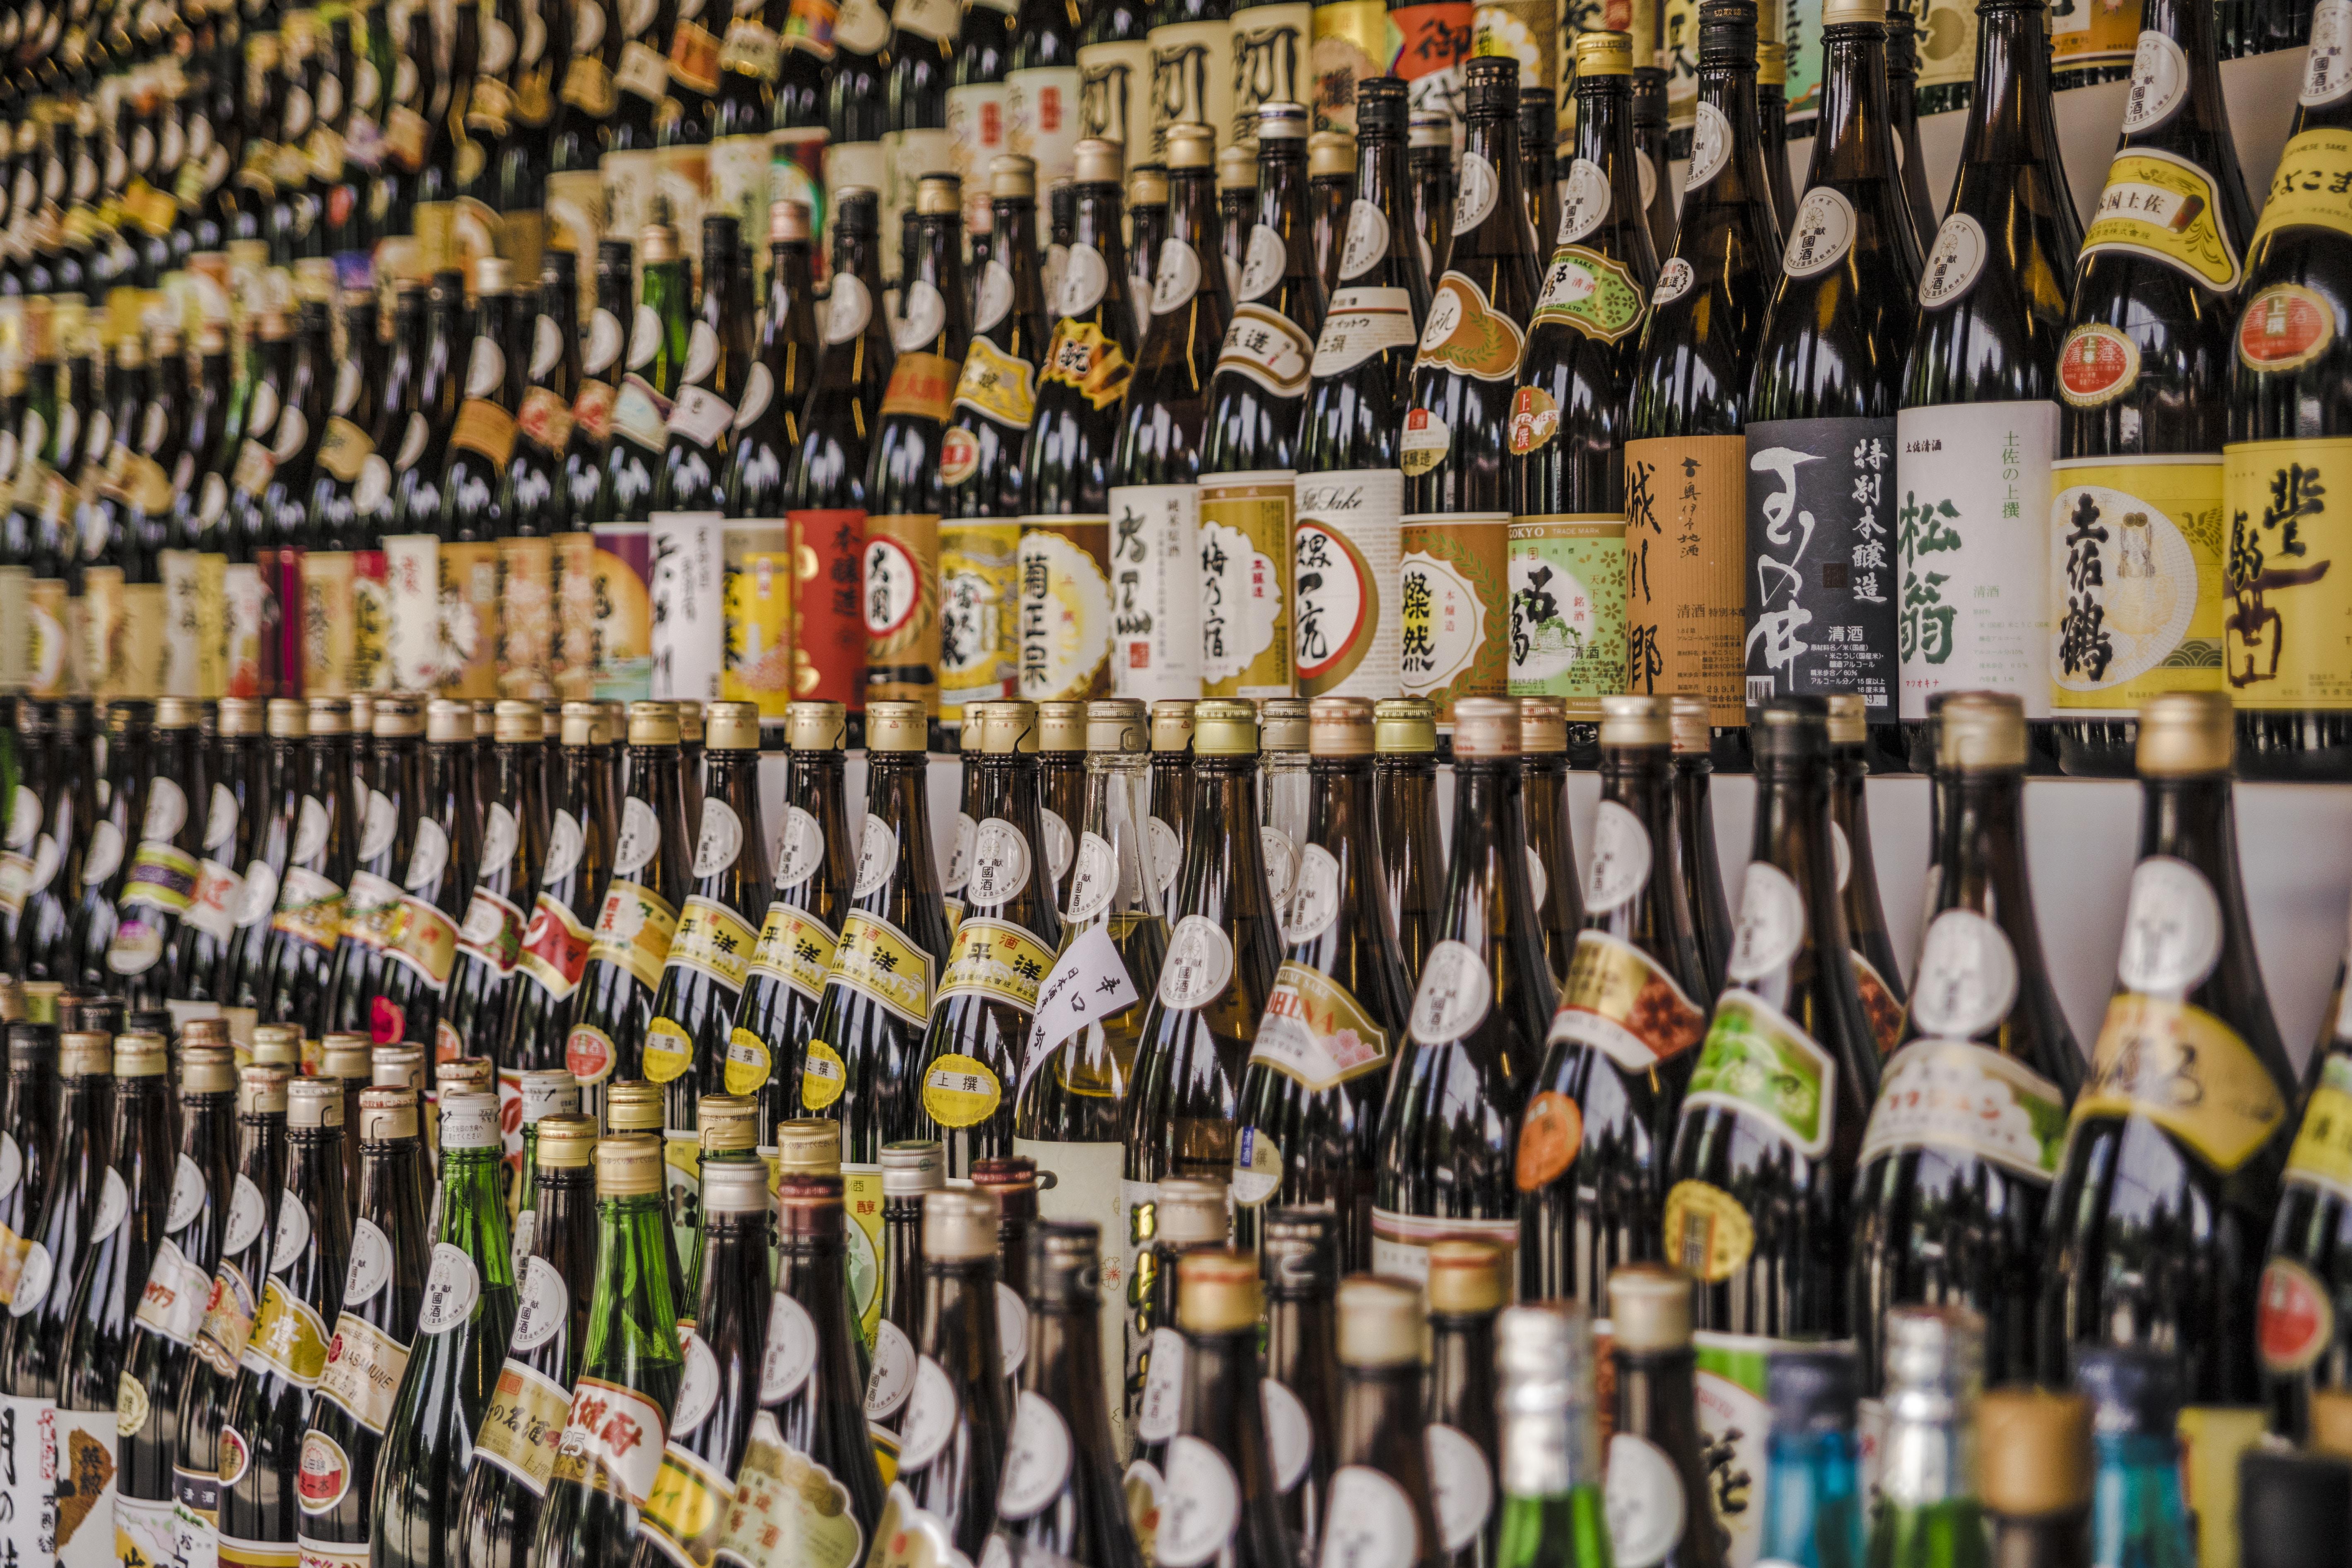 assorted-brand liquor bottle display